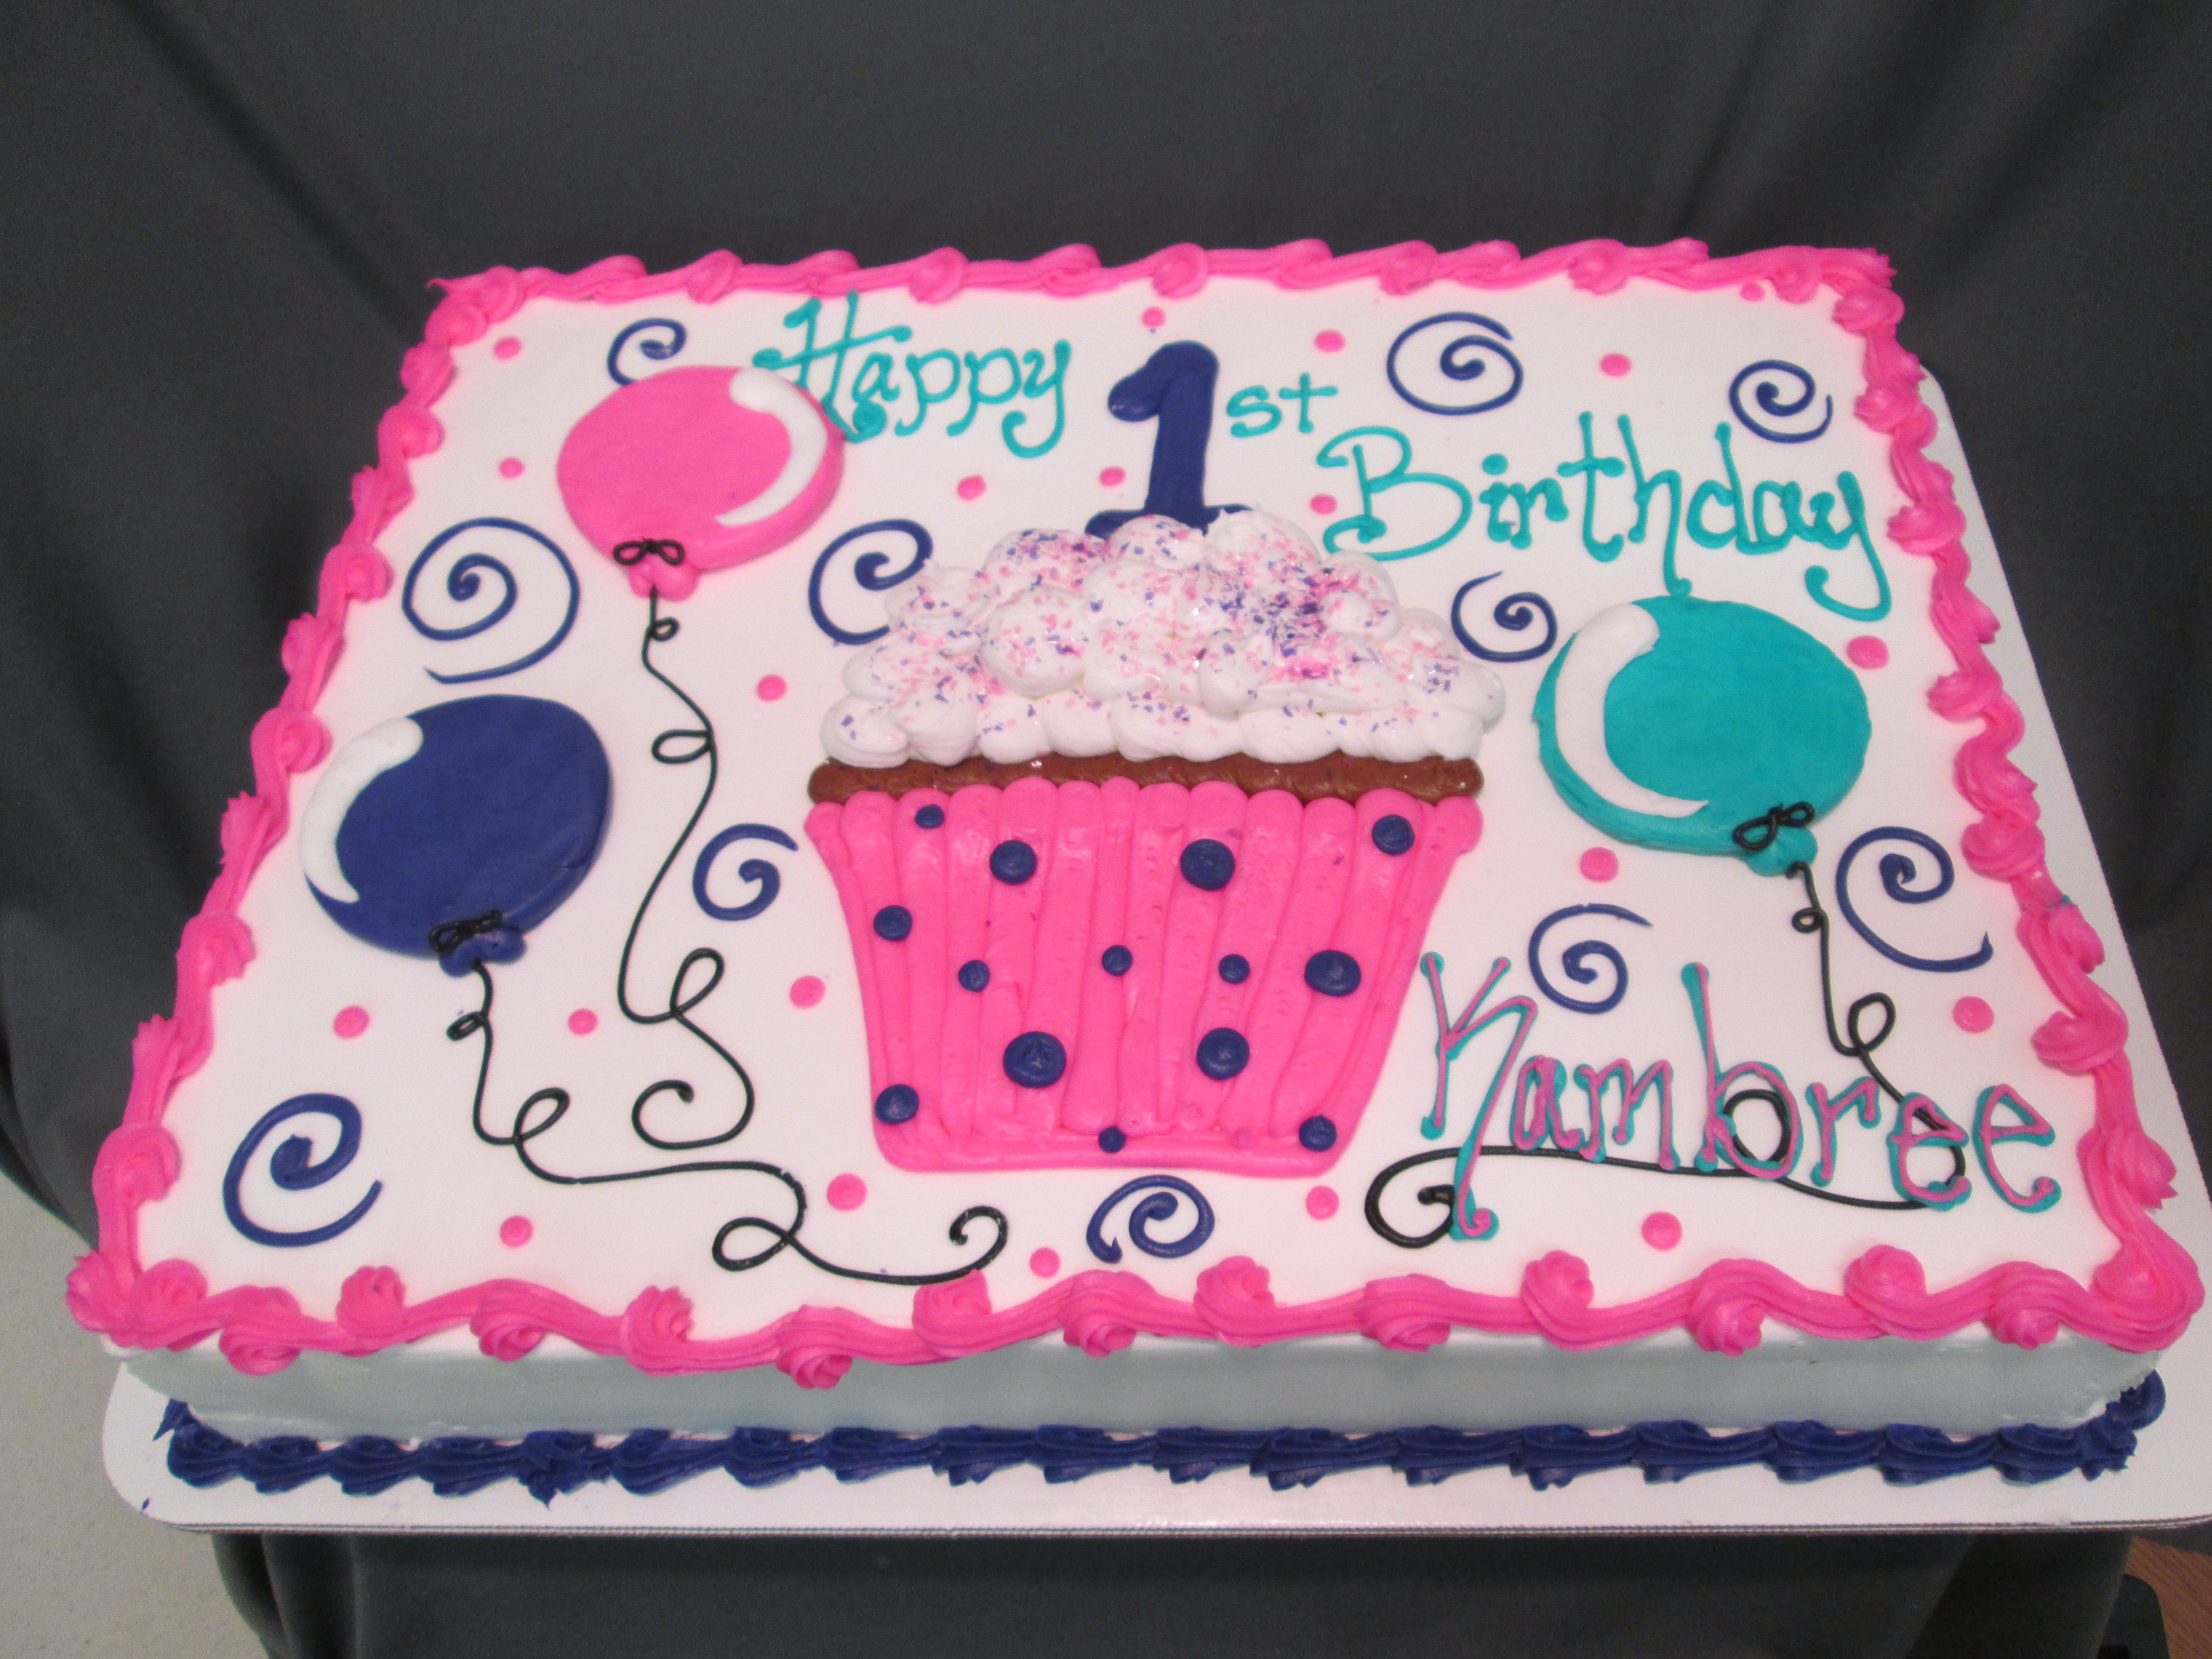 Cupcake and Balloon First Birthday Sheet Cake sugarshackscia